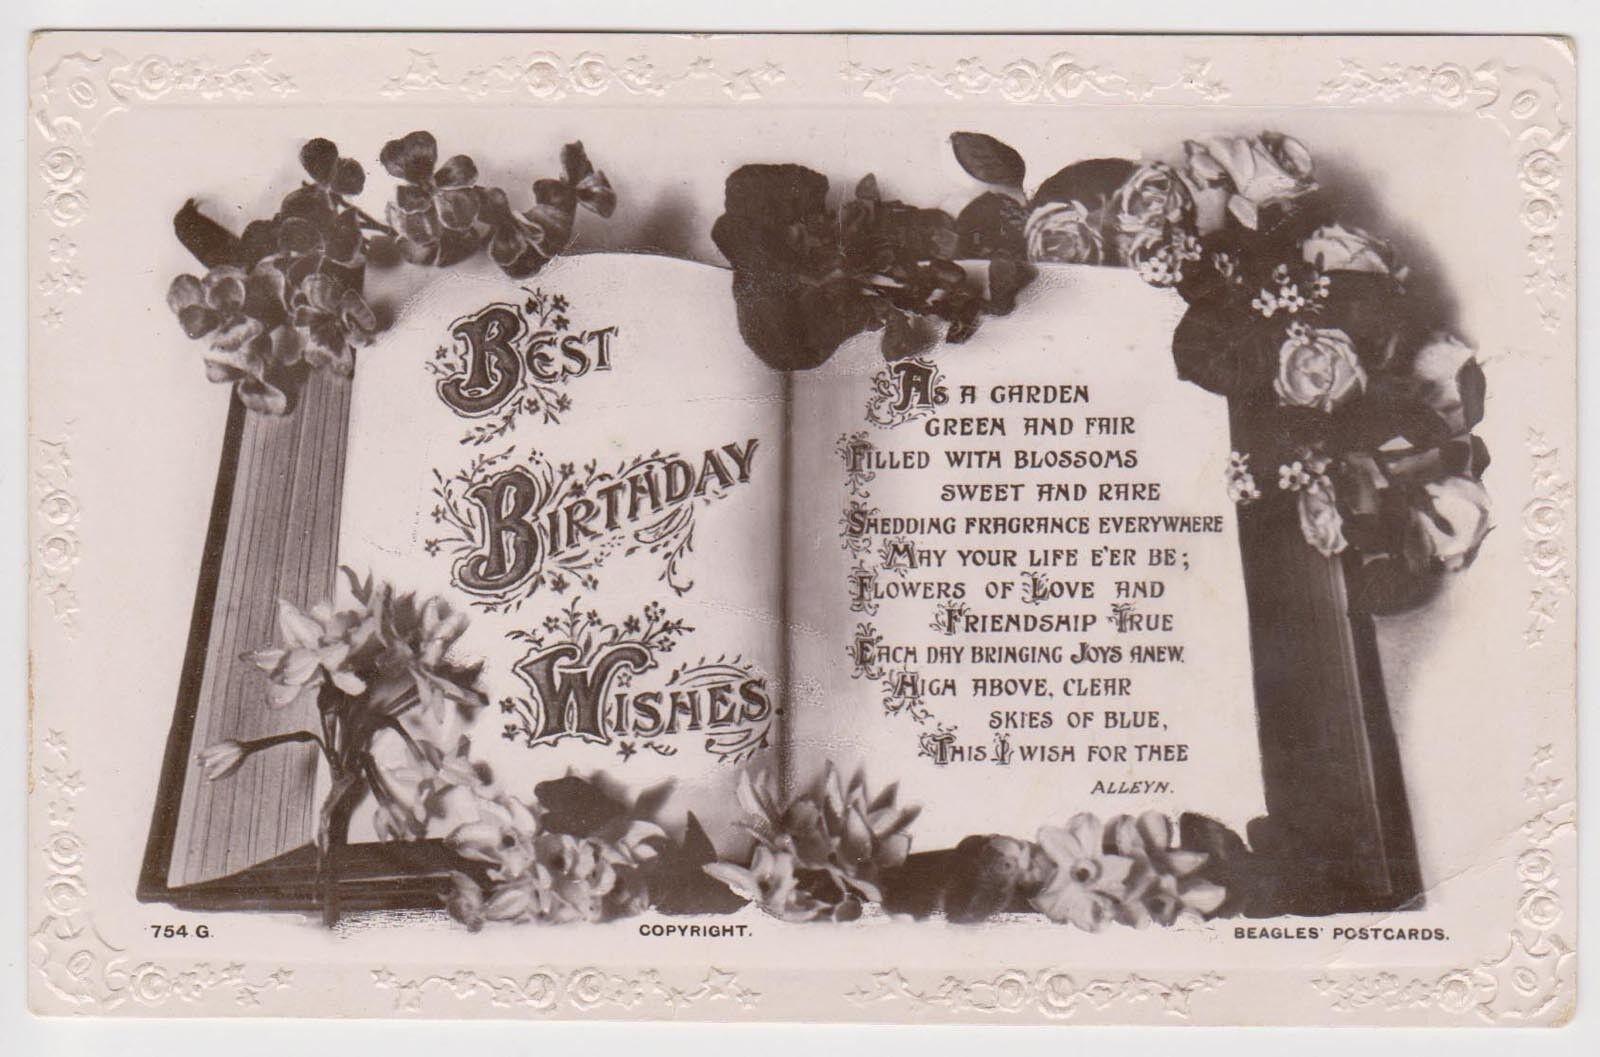 Art ez75 1910 au postcards sydney birthday wishes kristyandbryce Image collections